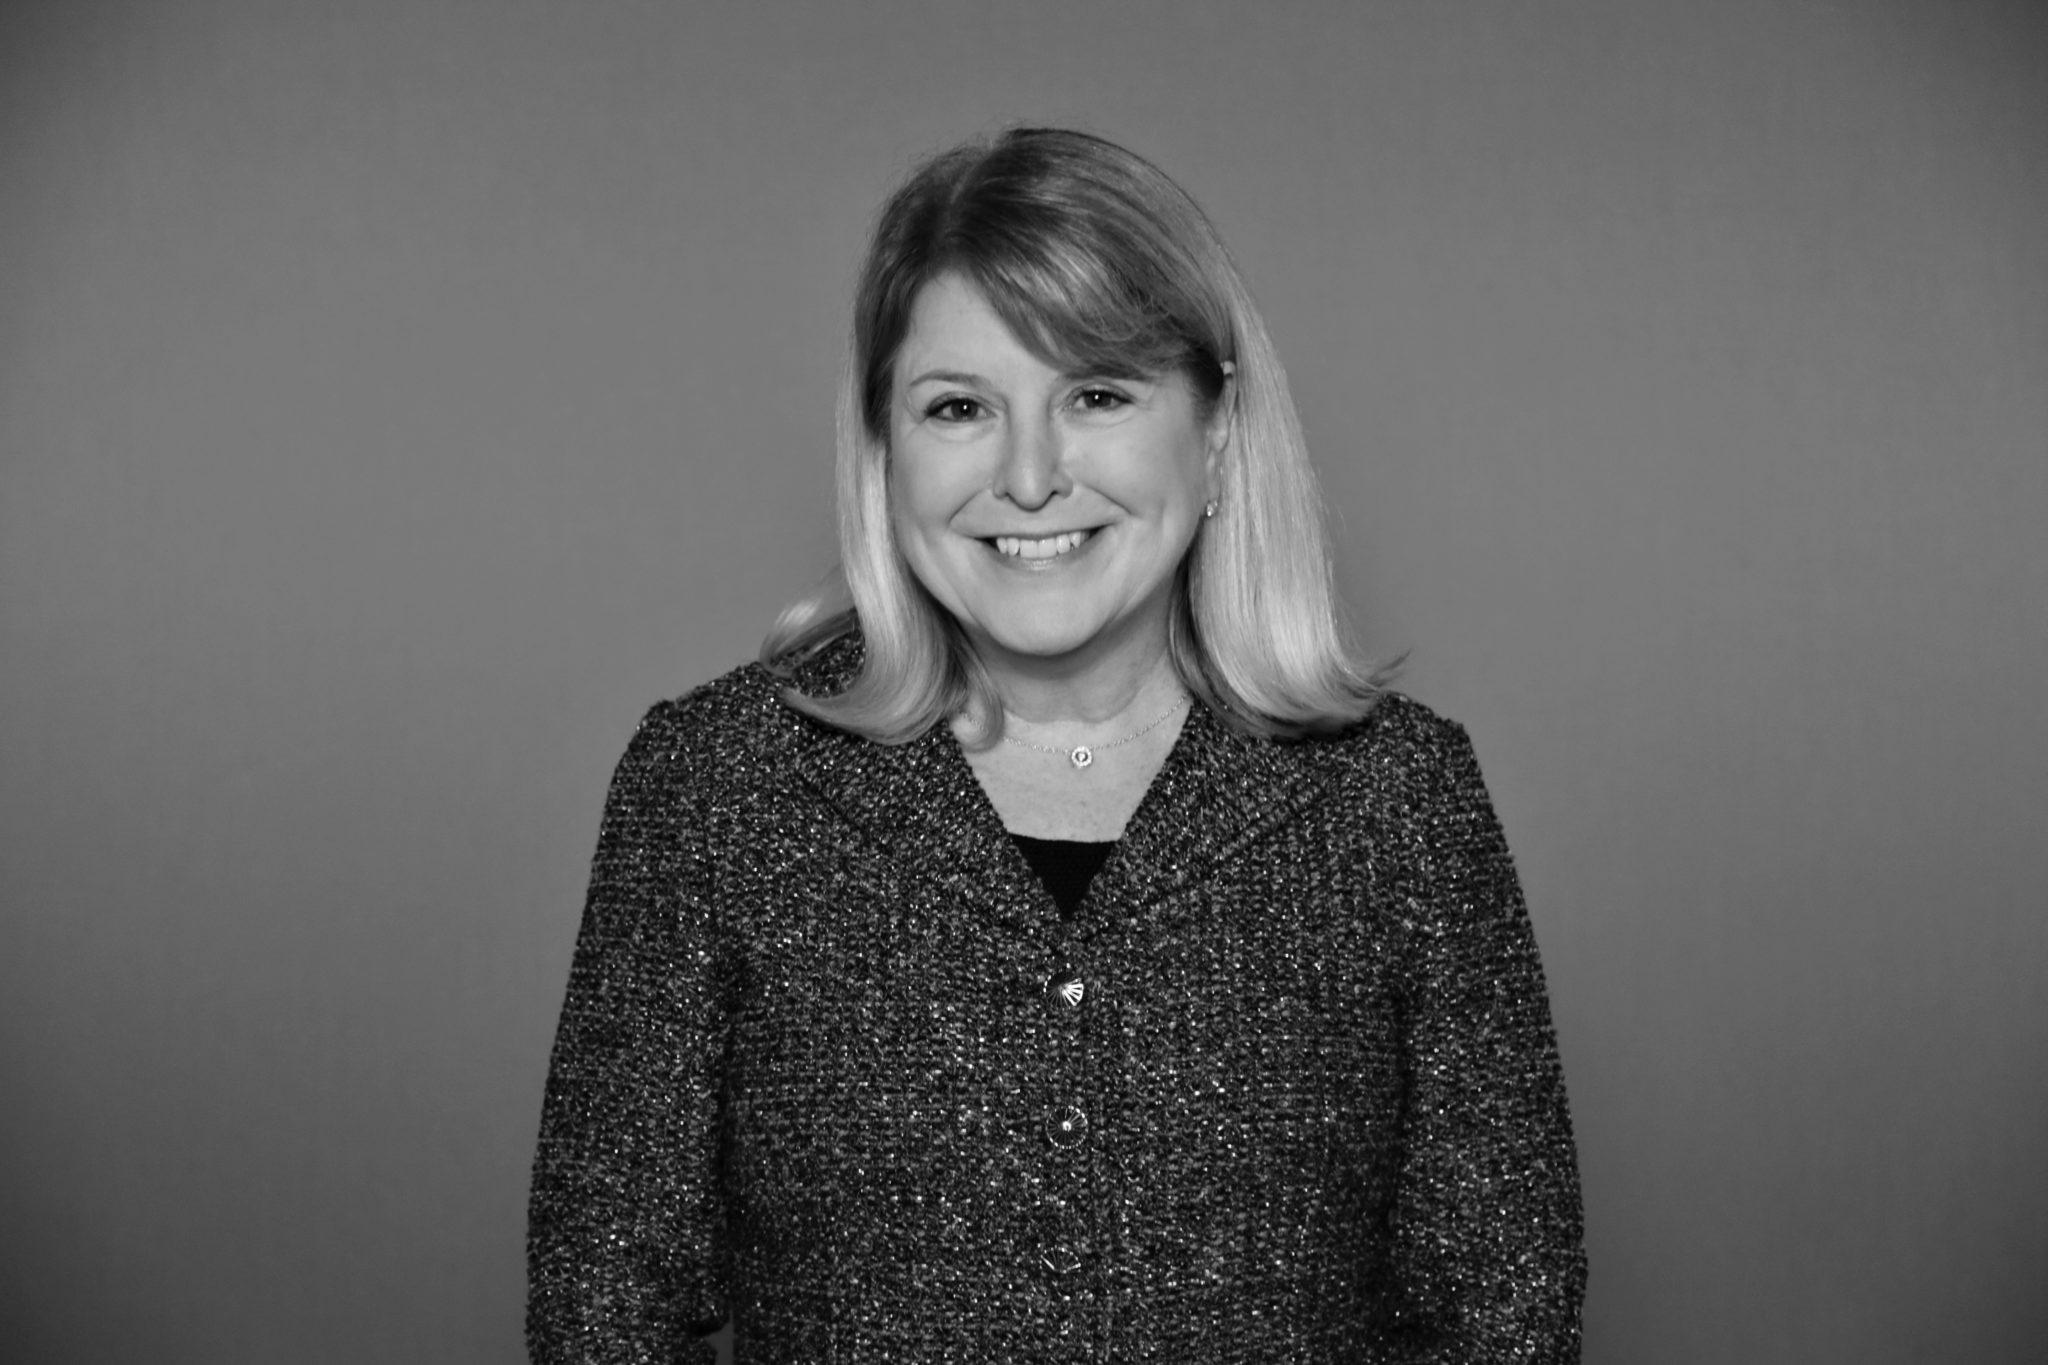 Susan Ogrodnik-Smith